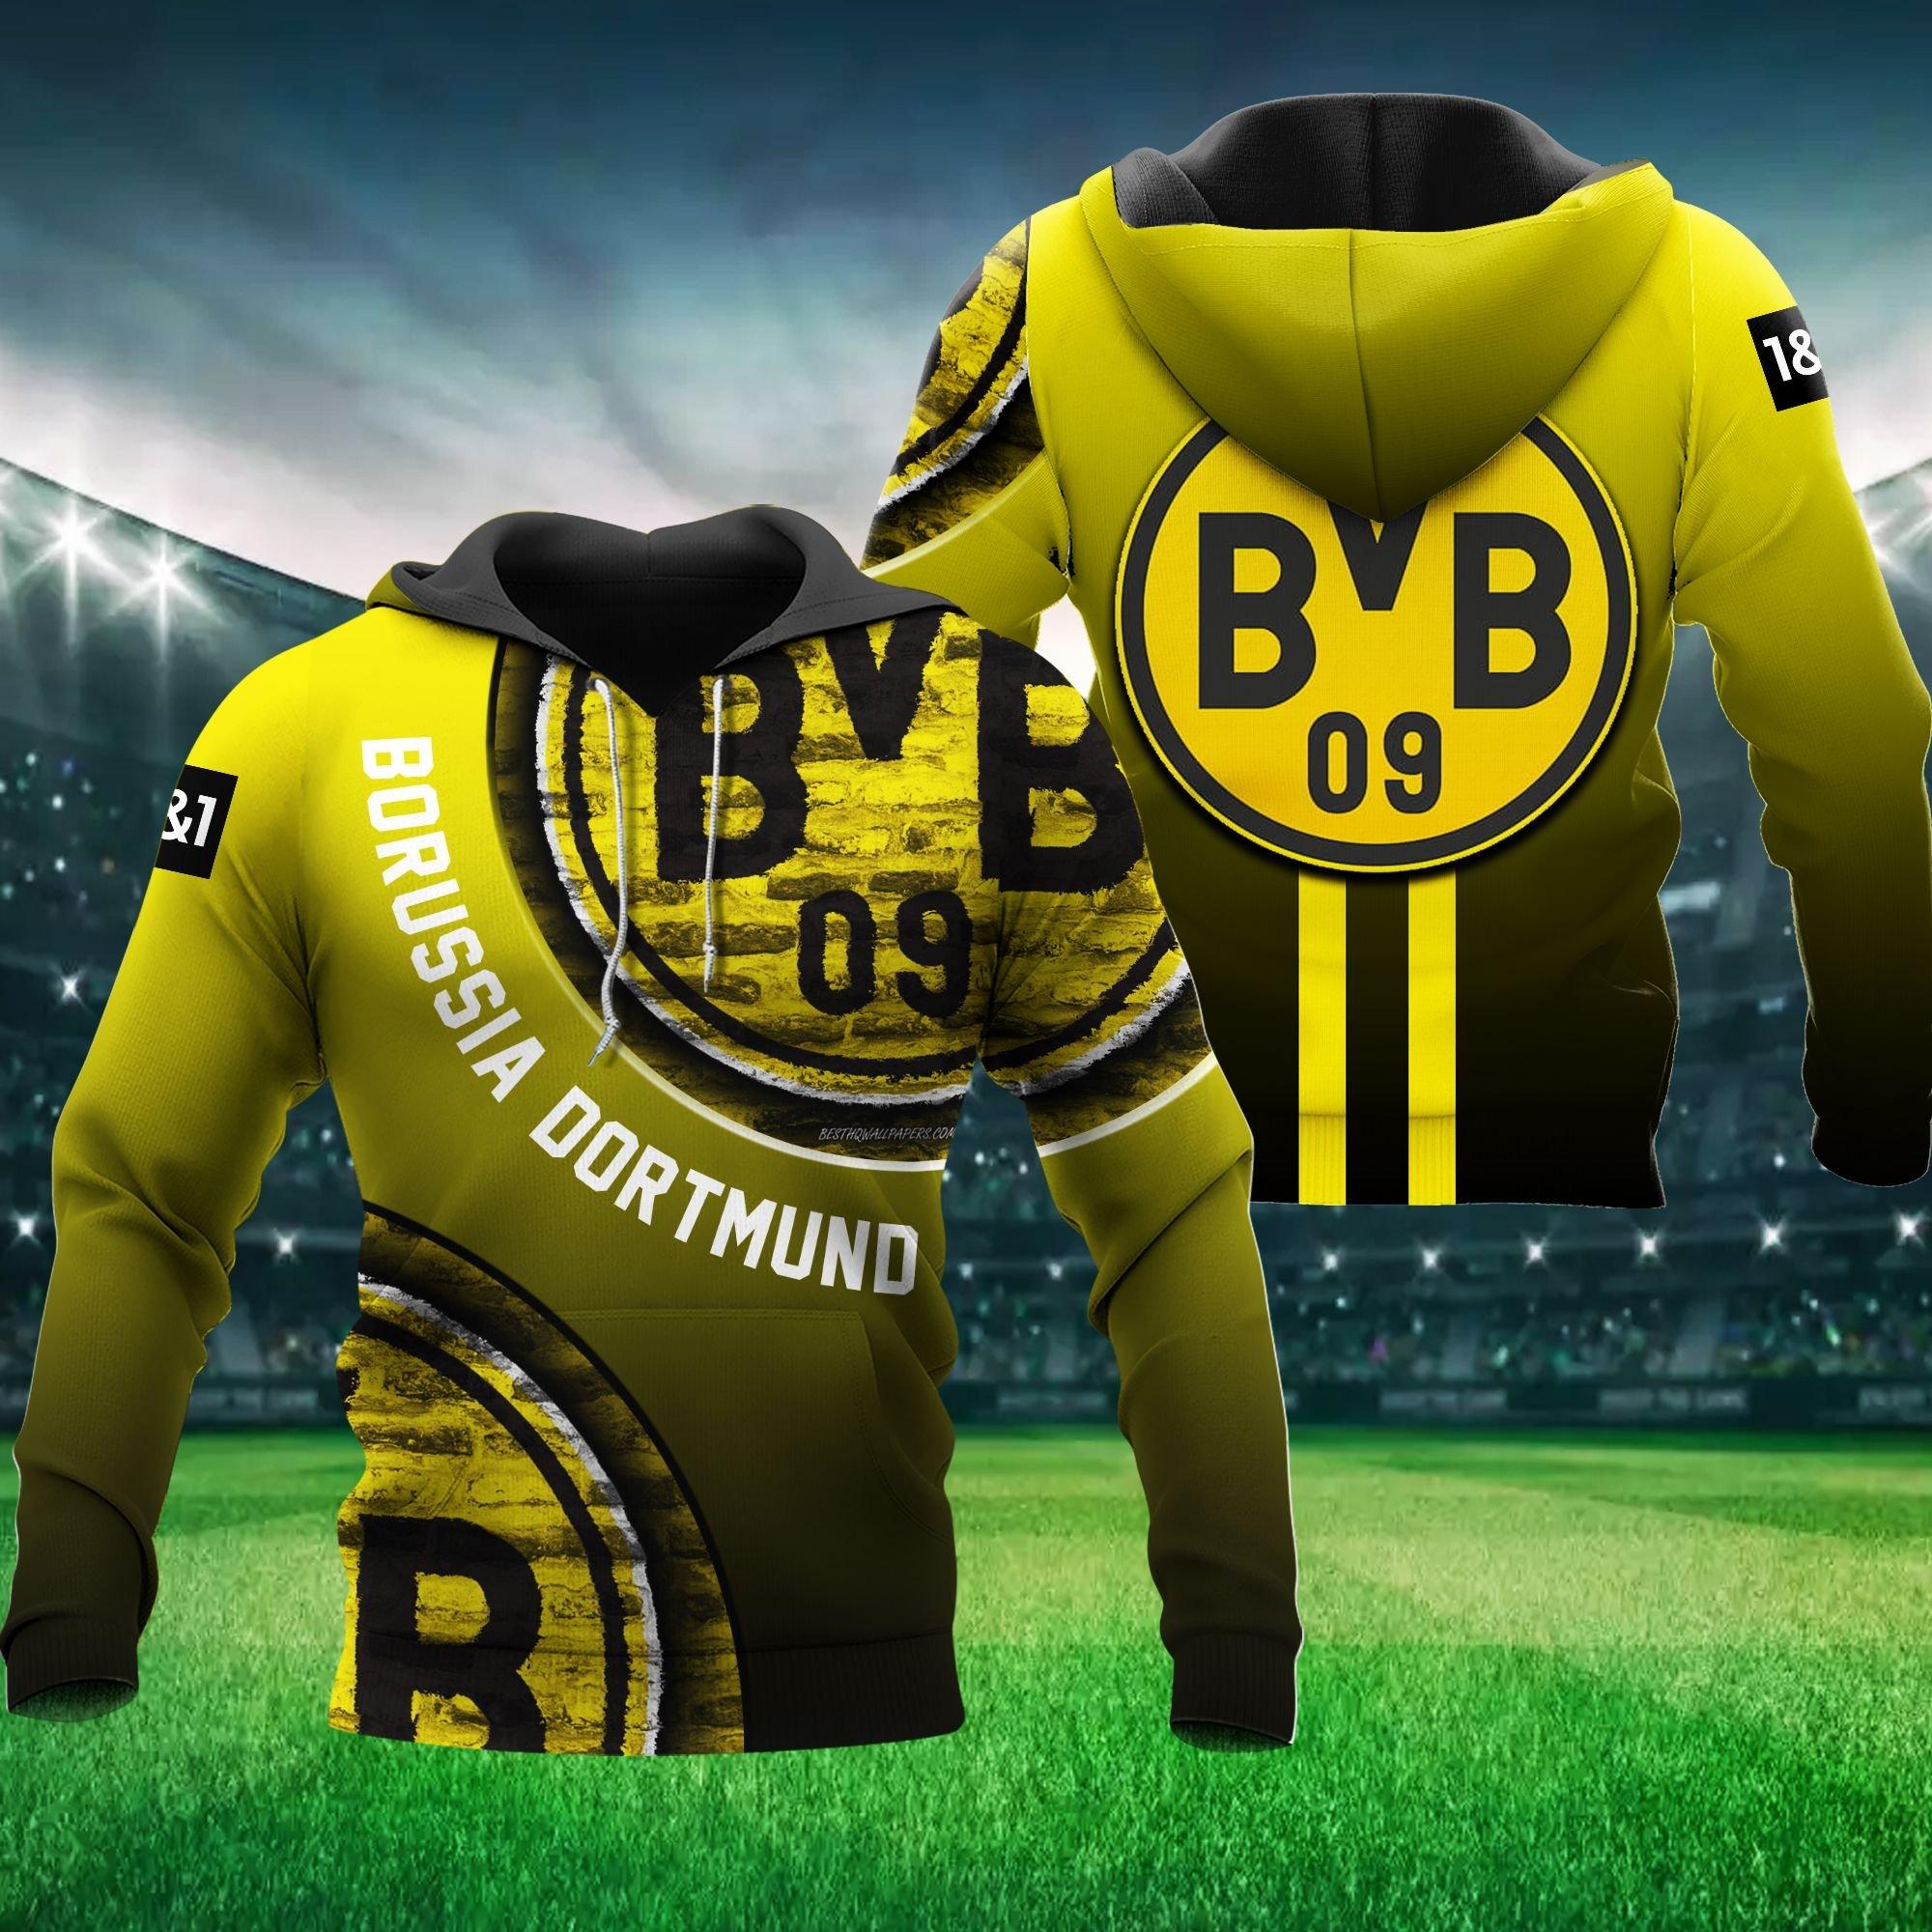 BvB Borussia Dortmund 3D Hoodie